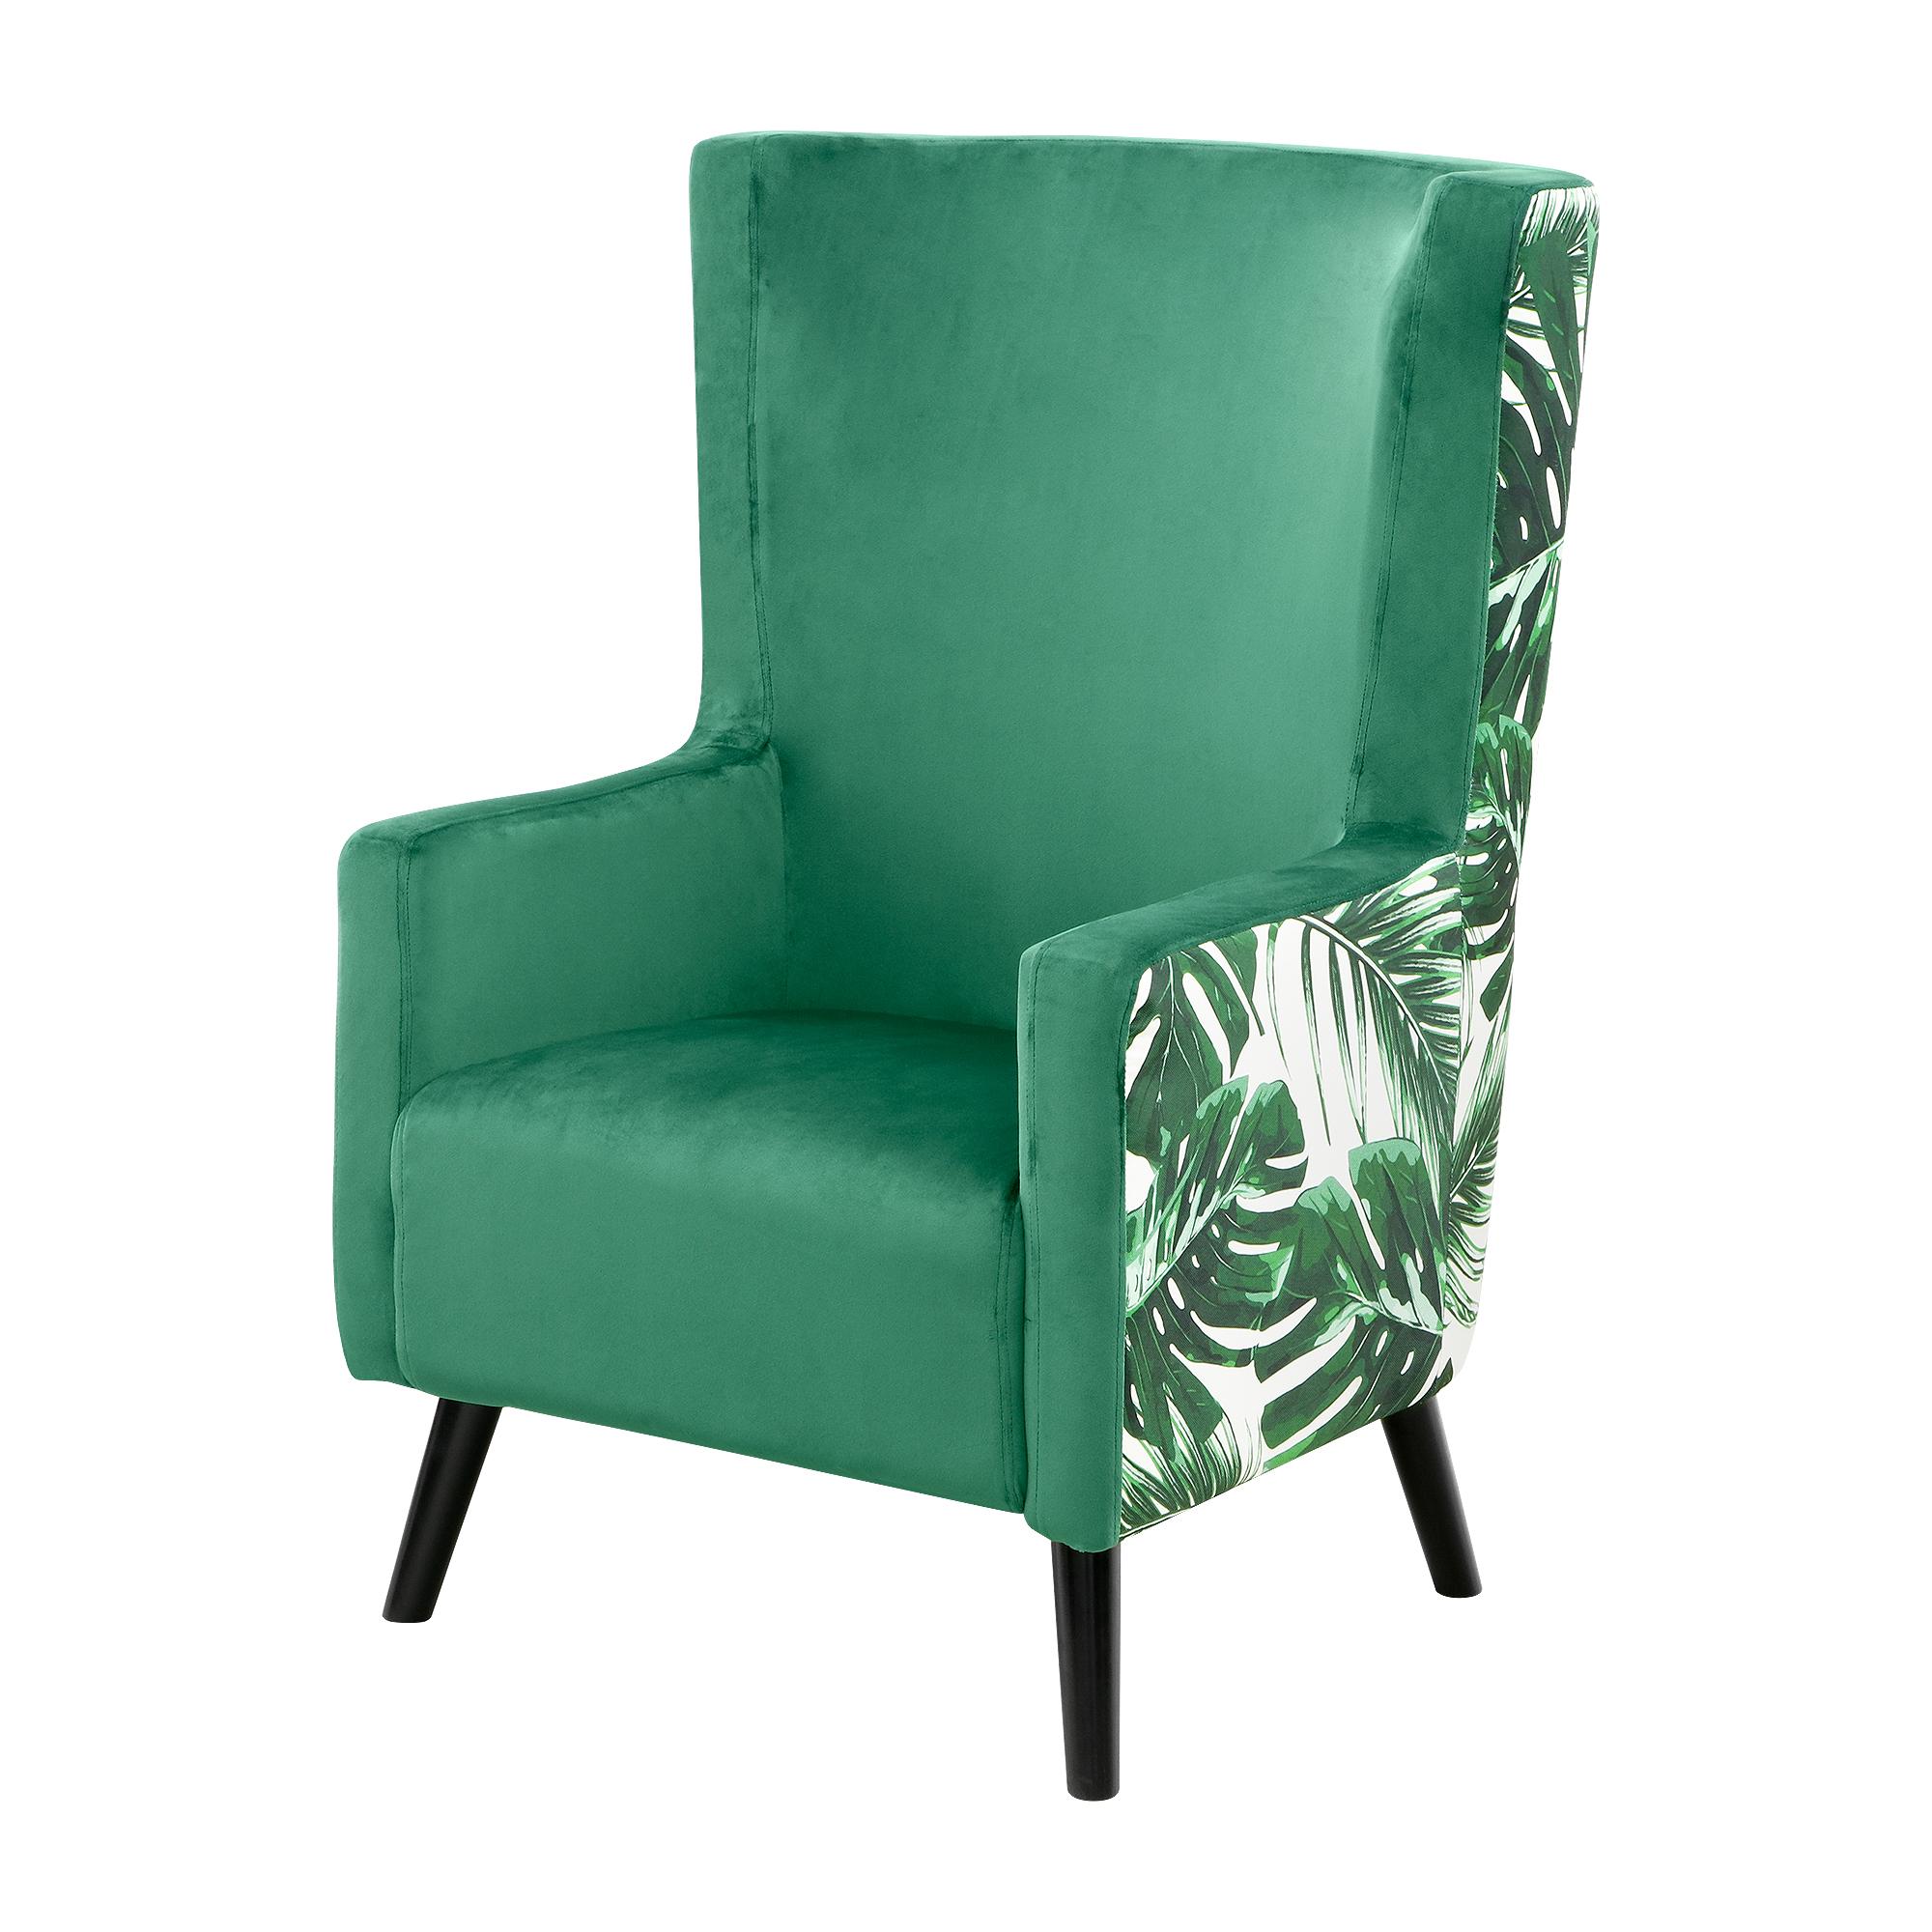 Кресло Deko 70х74х110 см кресло deko 66х66х80 см